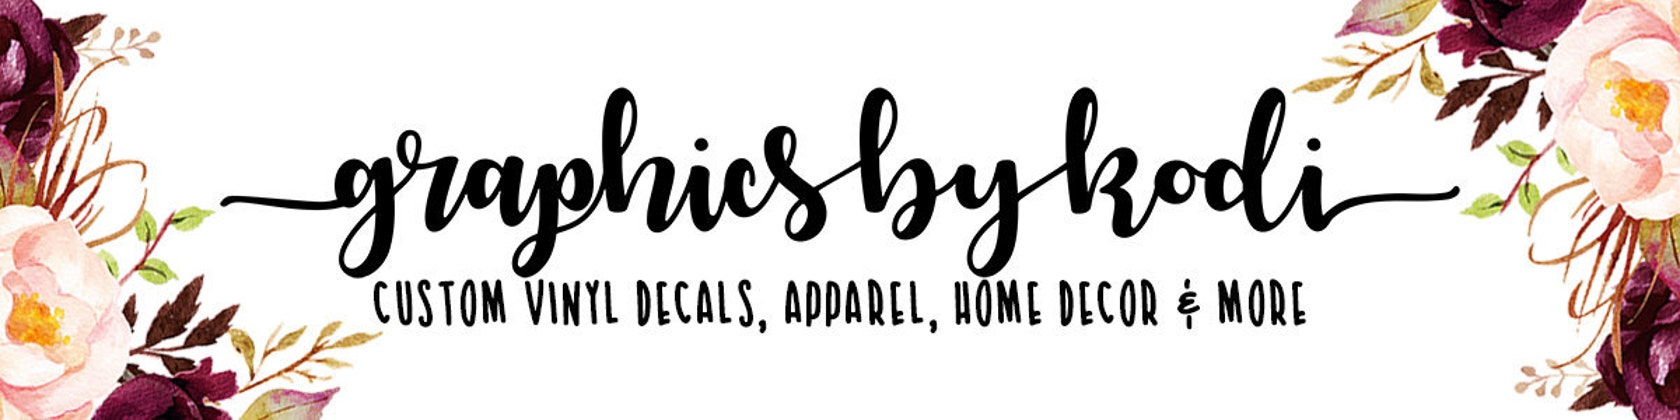 CUSTOM VINYL DECALS APPAREL HOME DECOR MORE By Graphicsbykodi - Custom vinyl decals las vegas